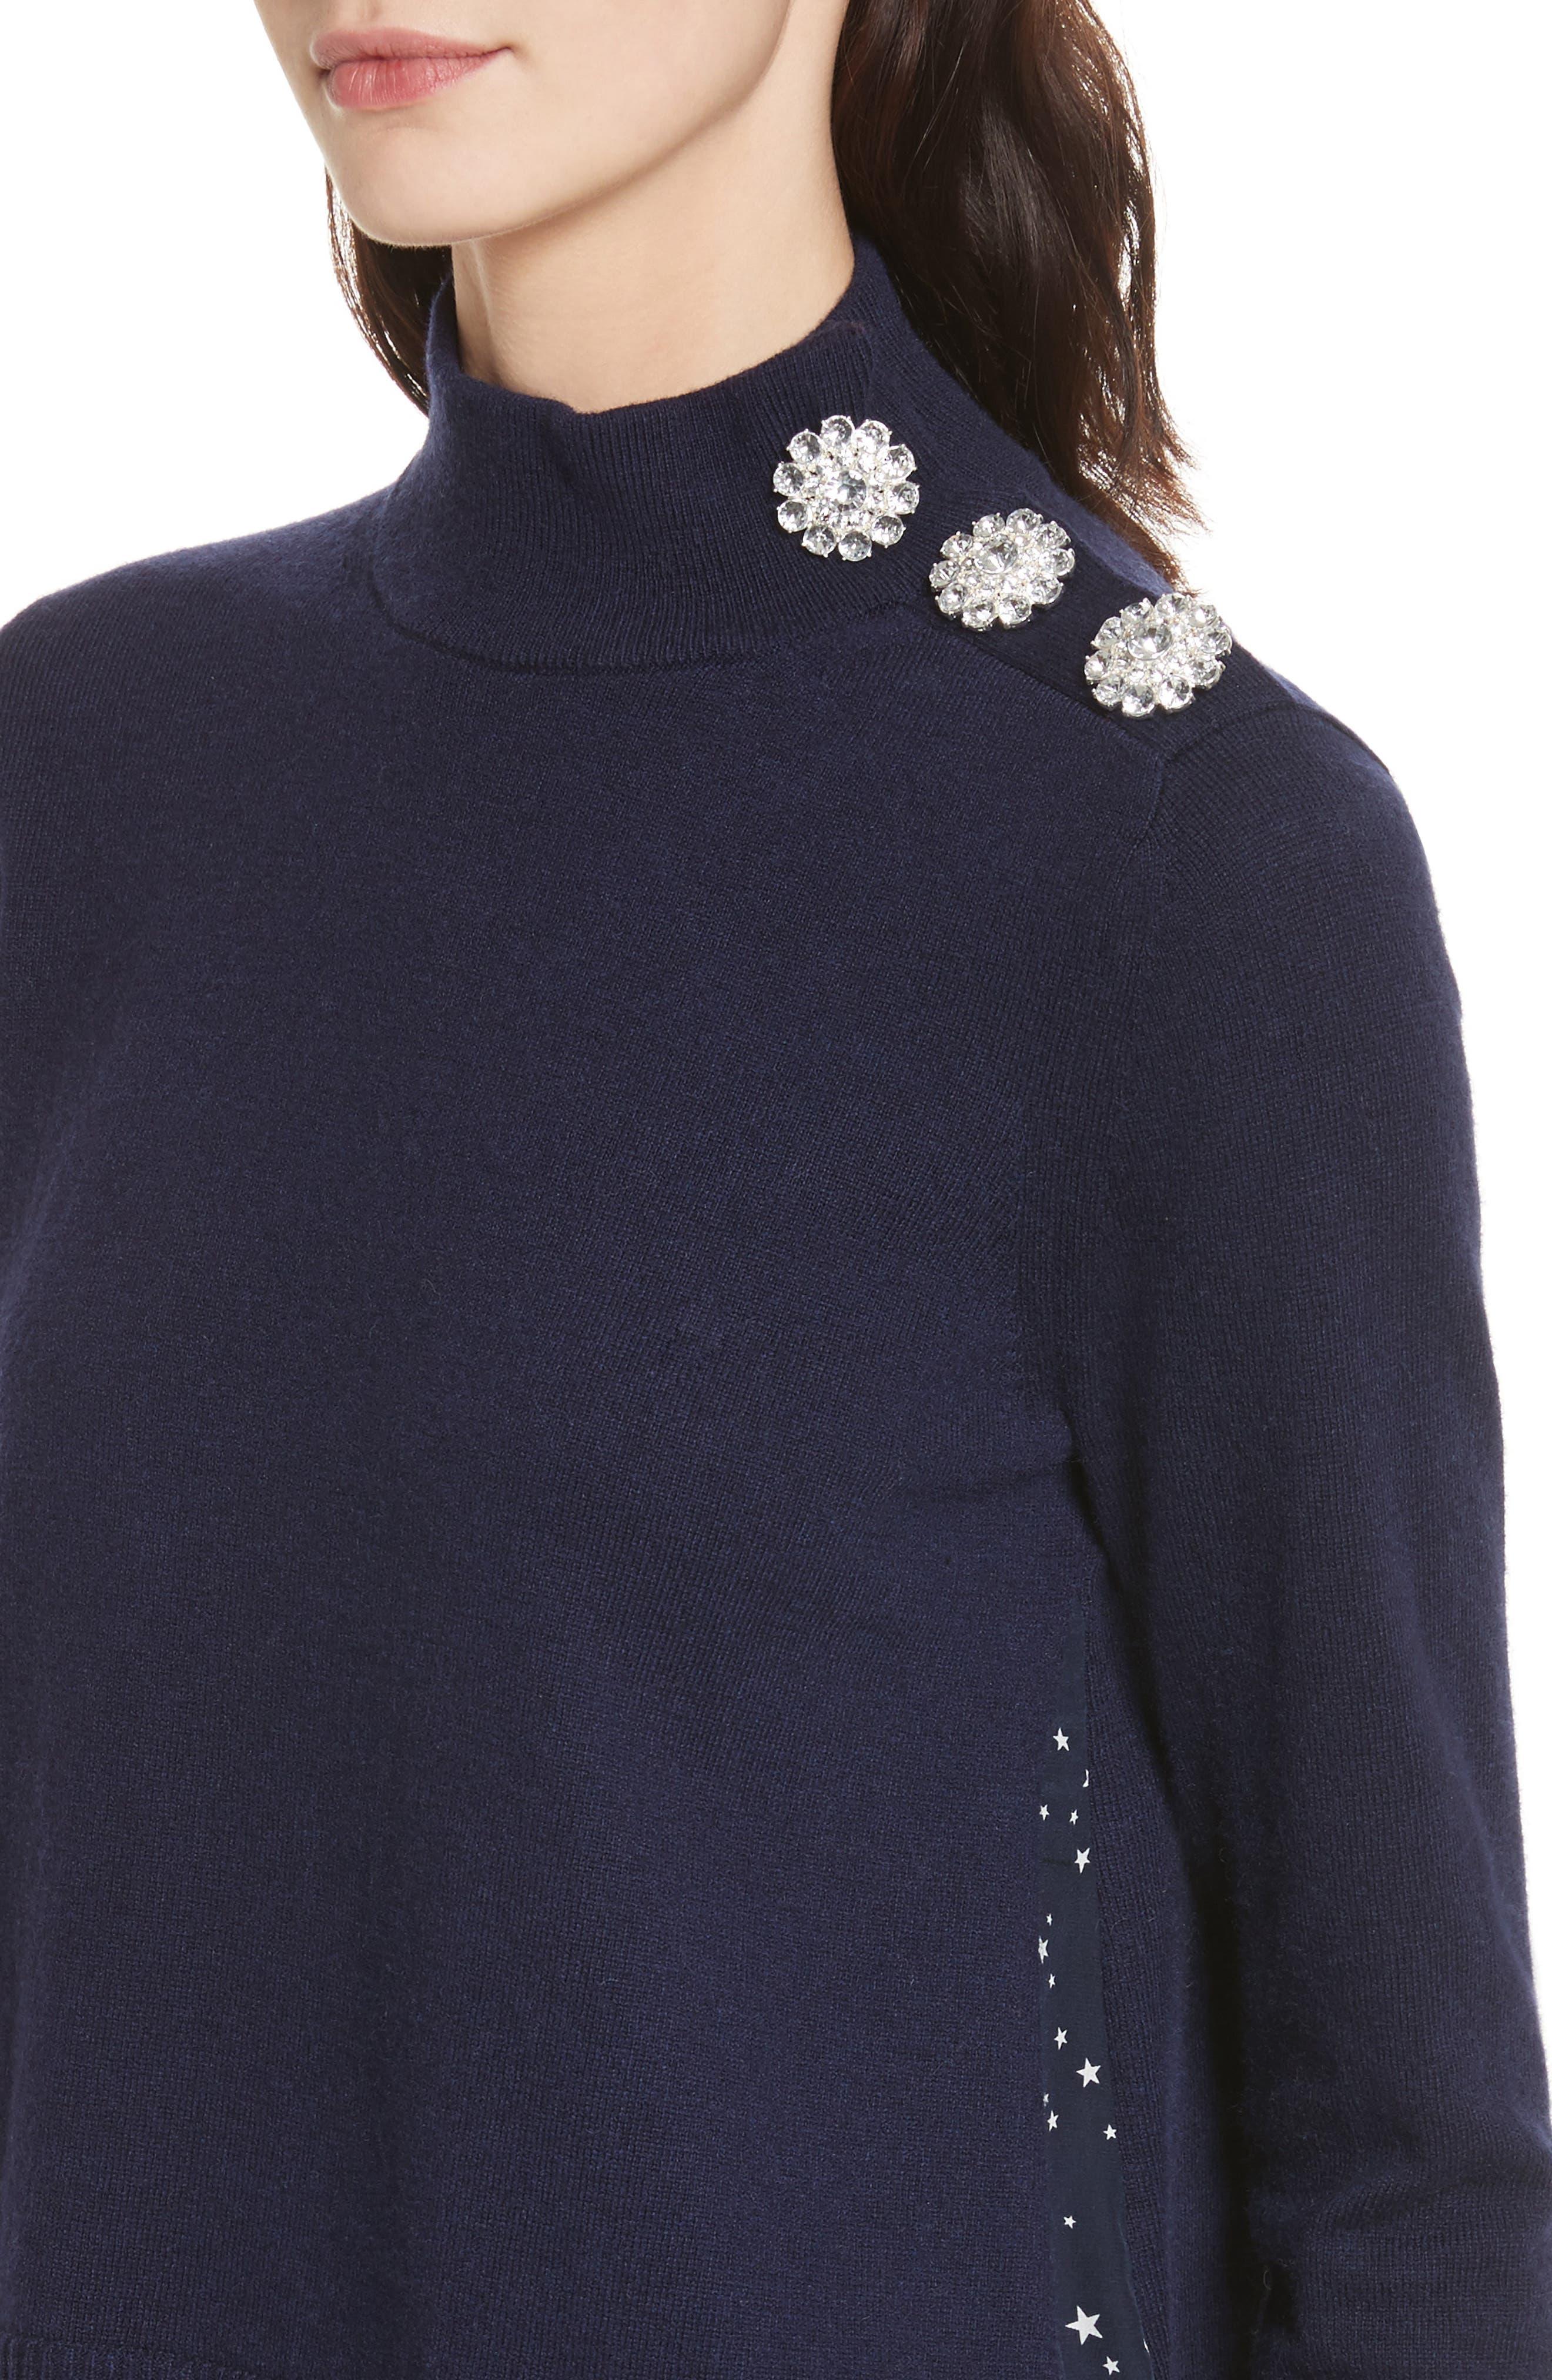 night sky mixed media sweater,                             Alternate thumbnail 4, color,                             Rich Navy